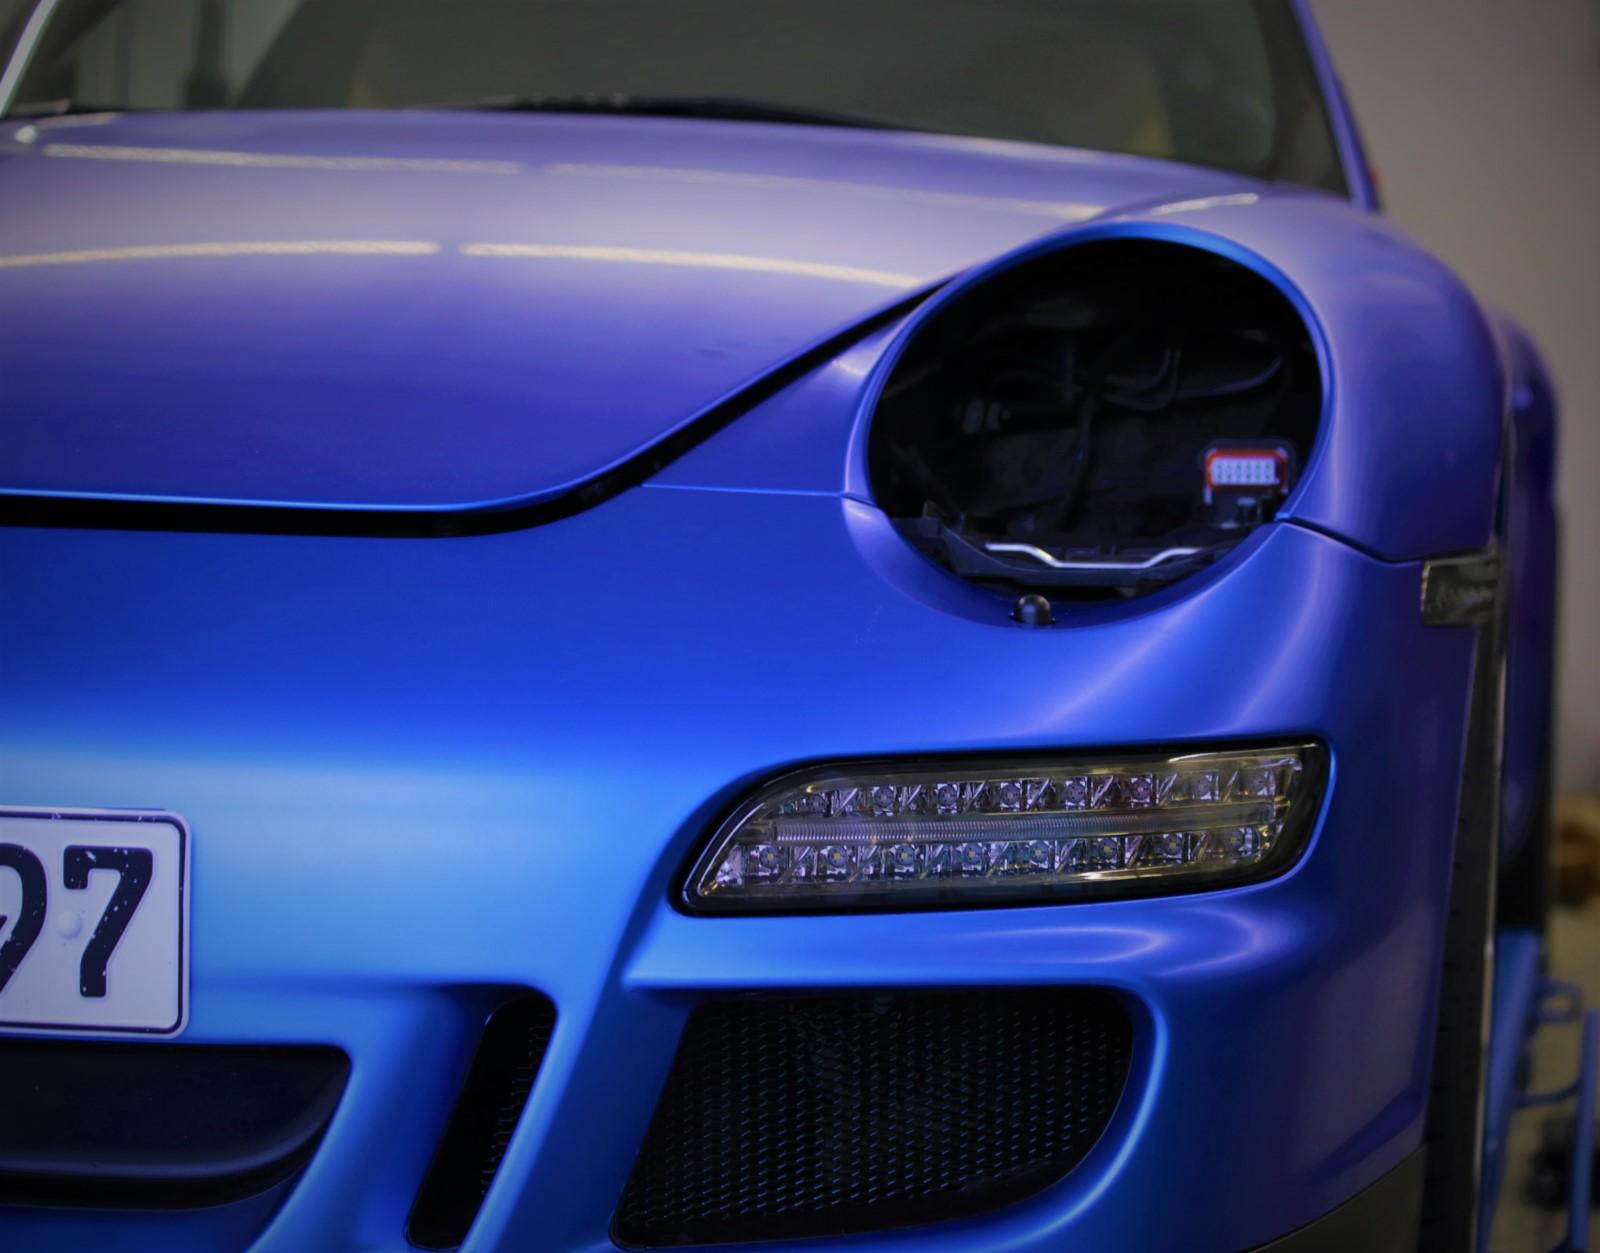 Auto folieren, Autofolierung Carwrapping Porsche 911 in 3M matt Blau metalic Front Motorhaube Stoßstange